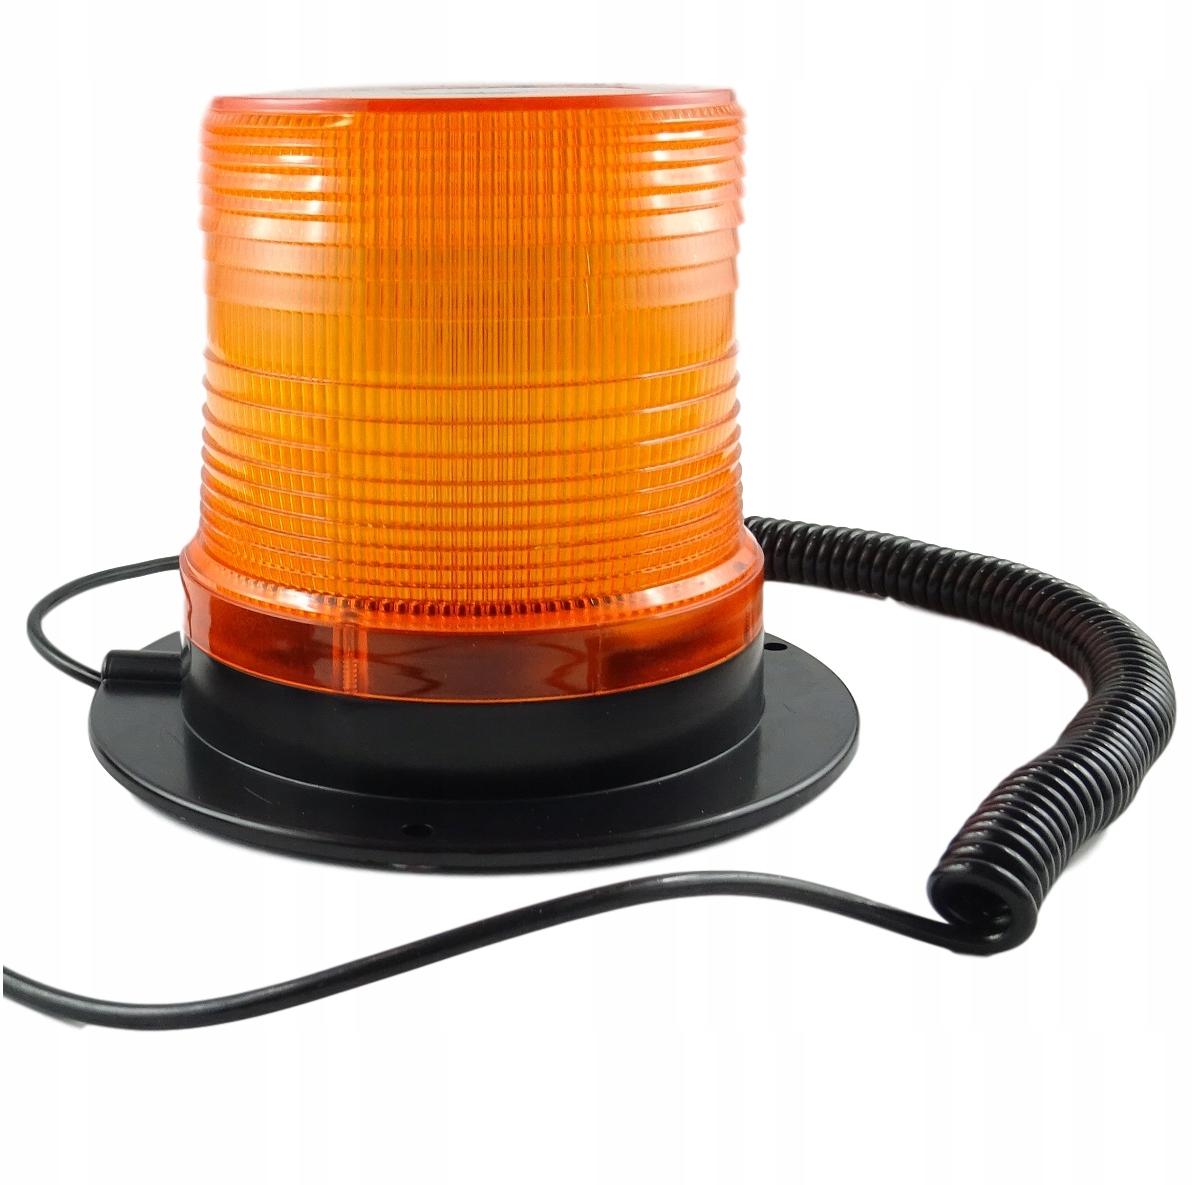 Lampa ostrzegawcza LED 12-24V mages kogut TT.826